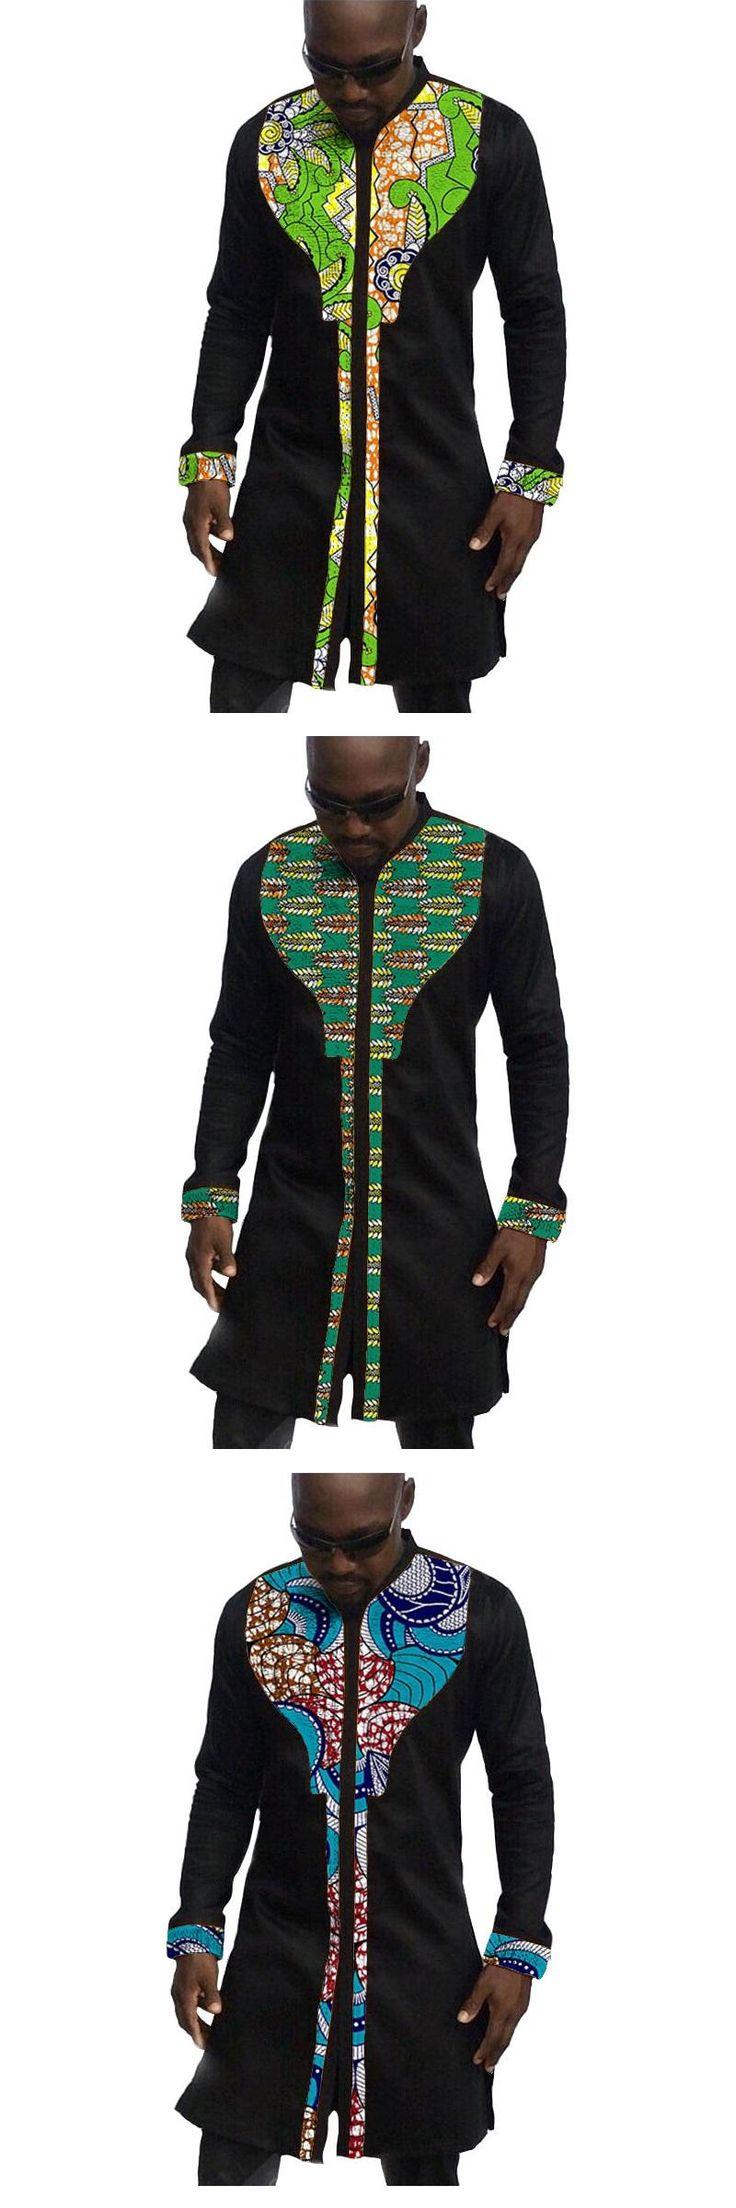 African mens shirts custom men african clothes fashion dashiki shirt mens long sleeve tops of africa clothing